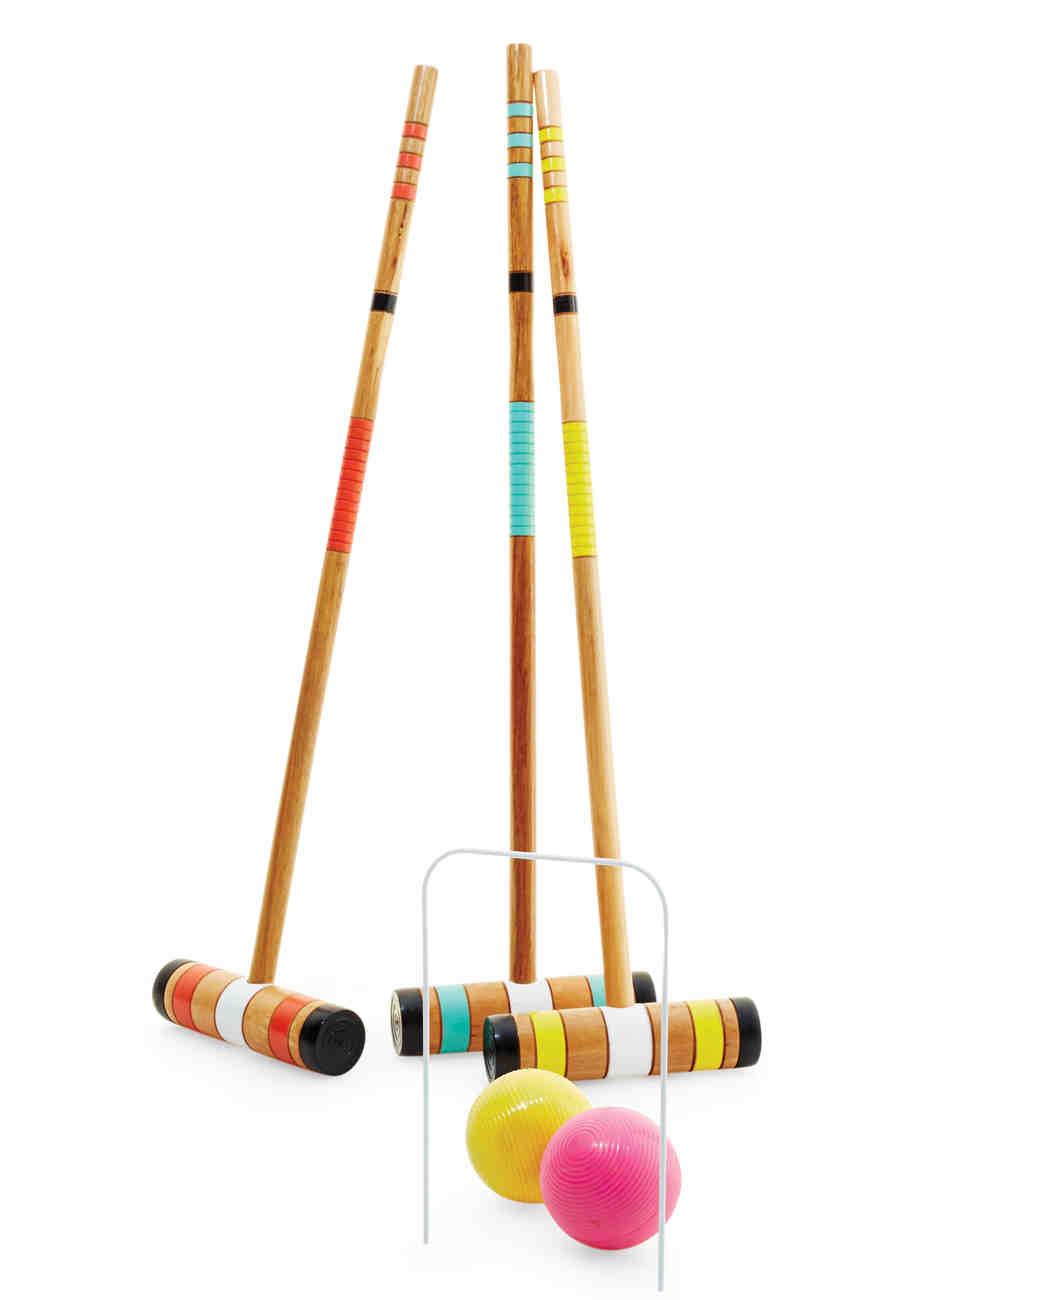 croquet-set-217-mwd110687.jpg